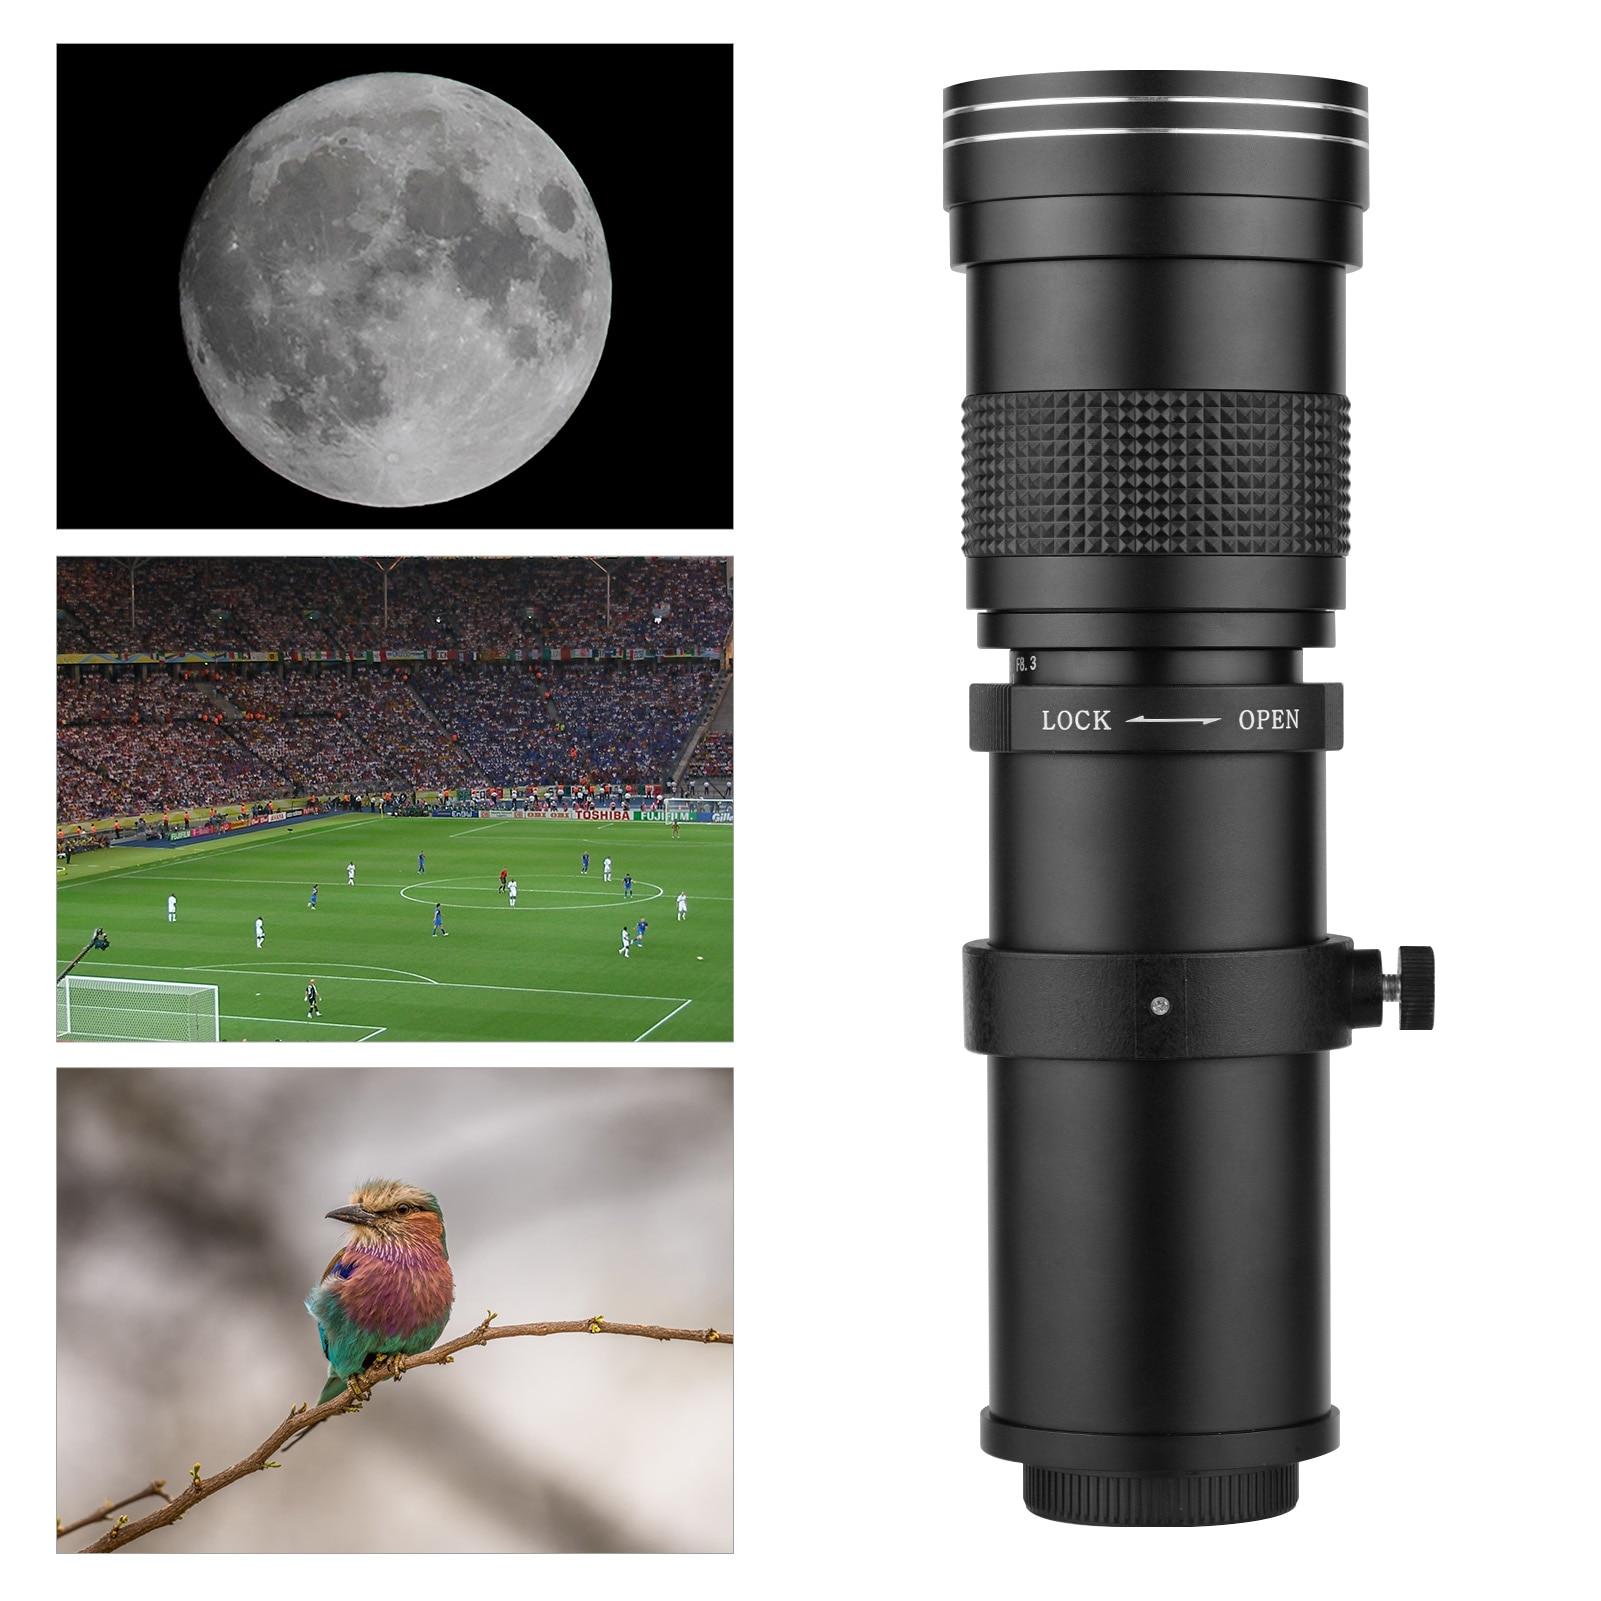 Appareil photo MF Super téléobjectif Zoom F/8.3-16 420-800mm T Mount with1/4 filetage pour Canon Nikon Sony Fujifilm Olympus appareils photo